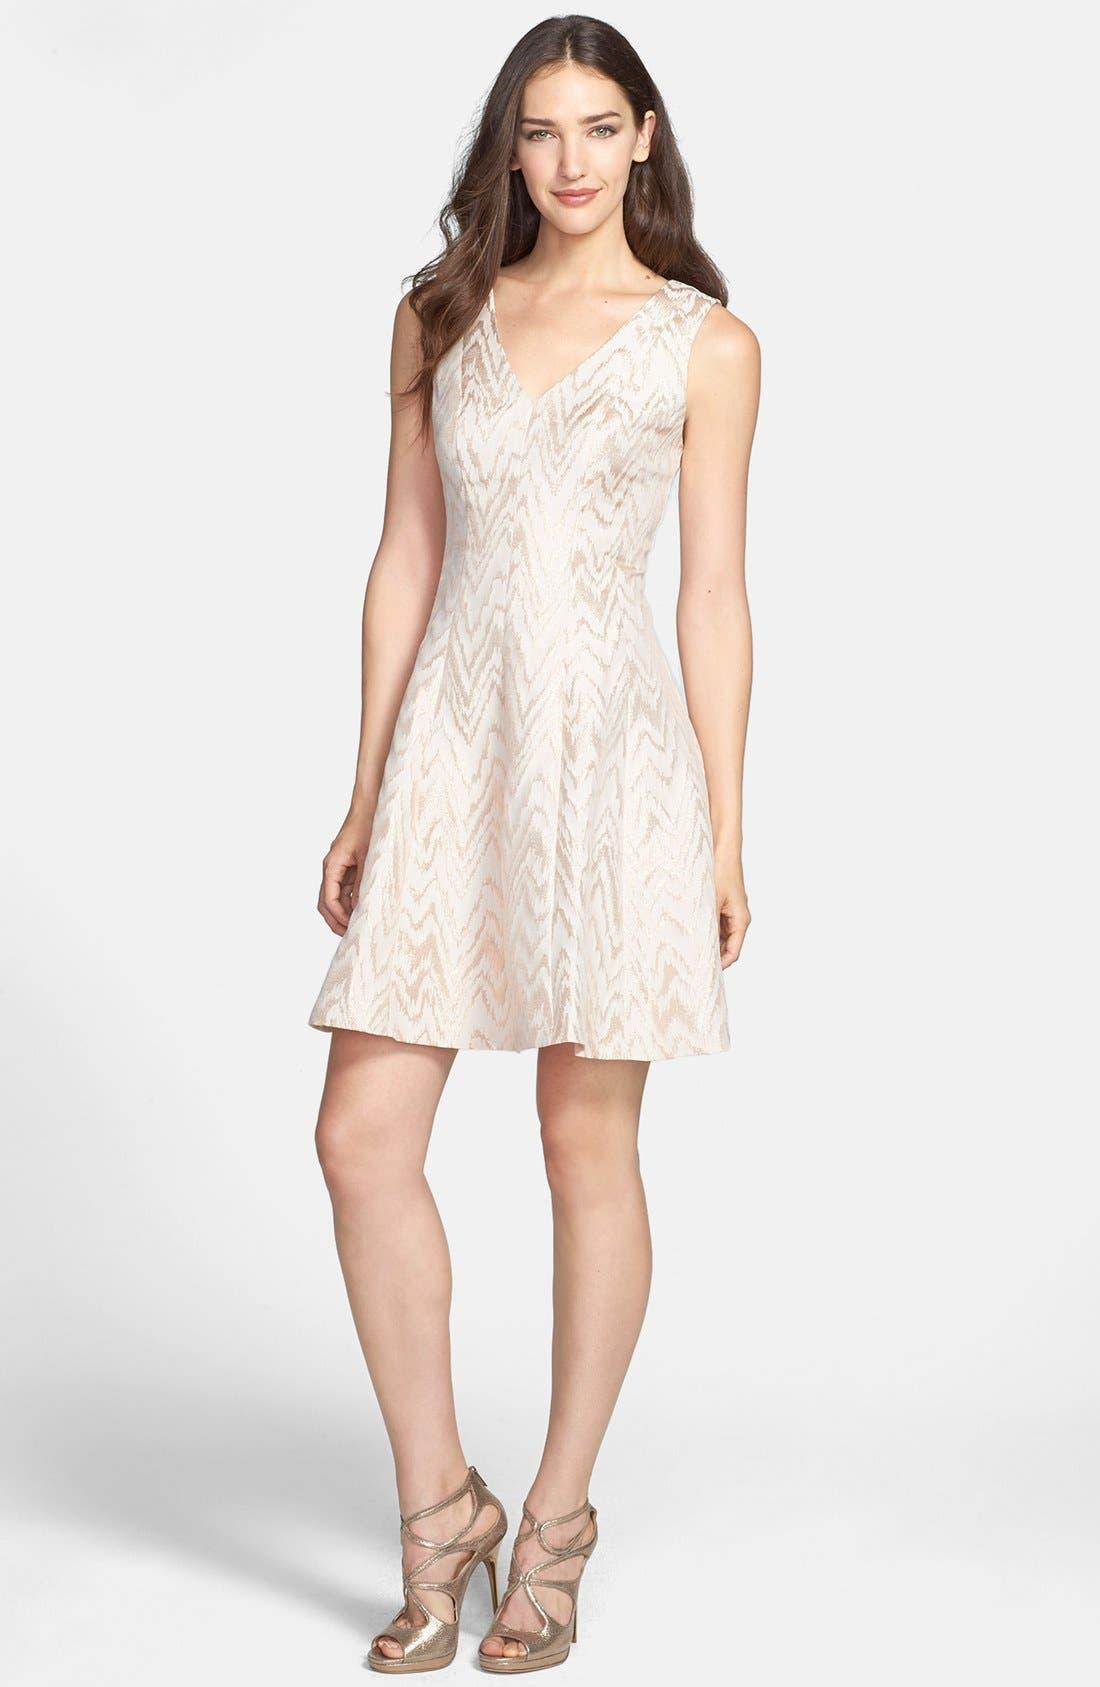 Main Image - Vince Camuto Metallic Jacquard Fit & Flare Dress